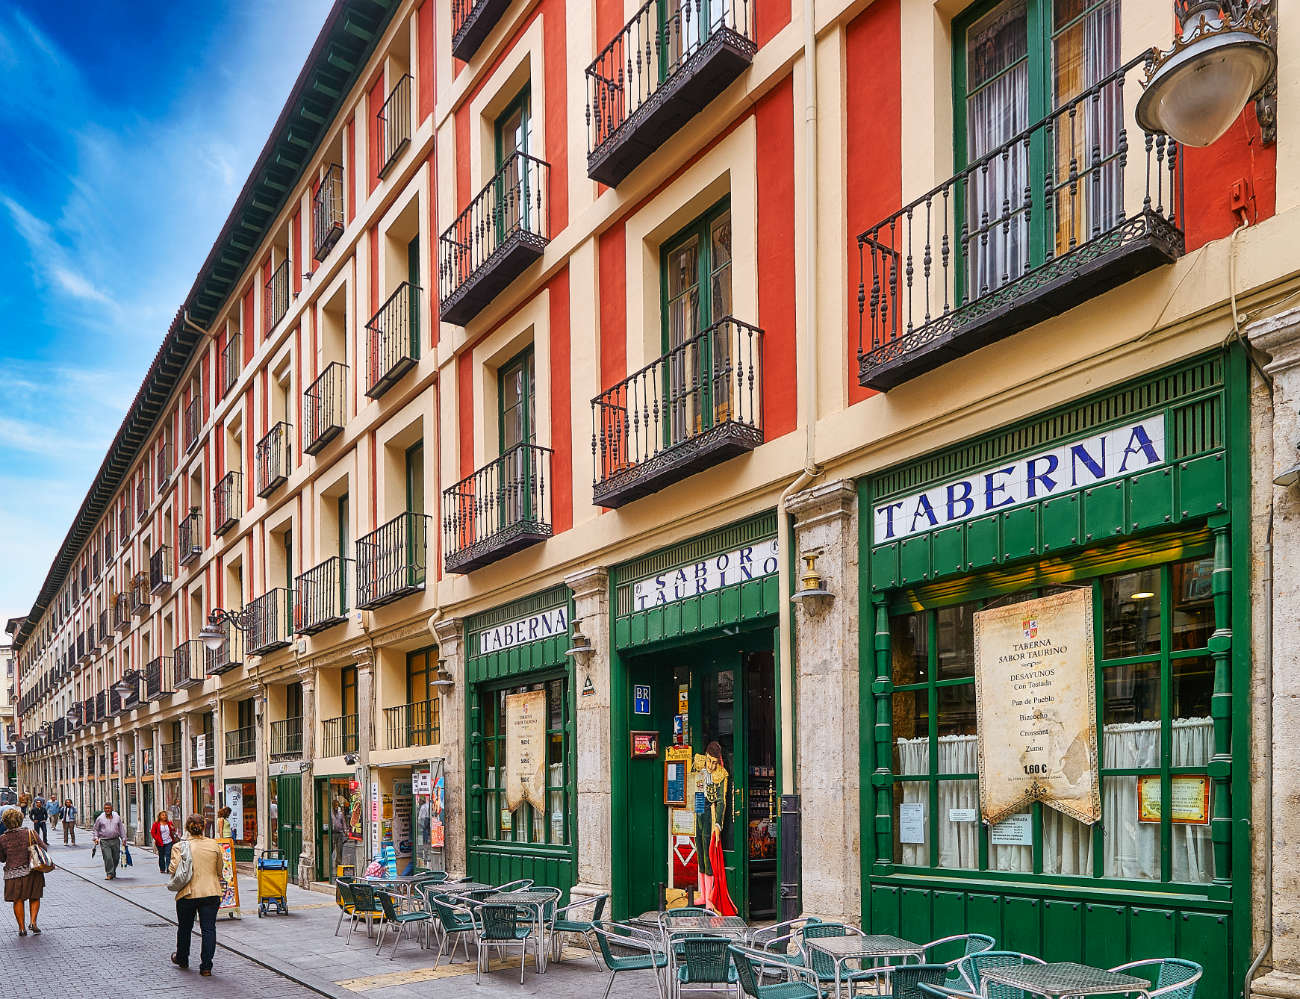 Calle Platerias Valladolid